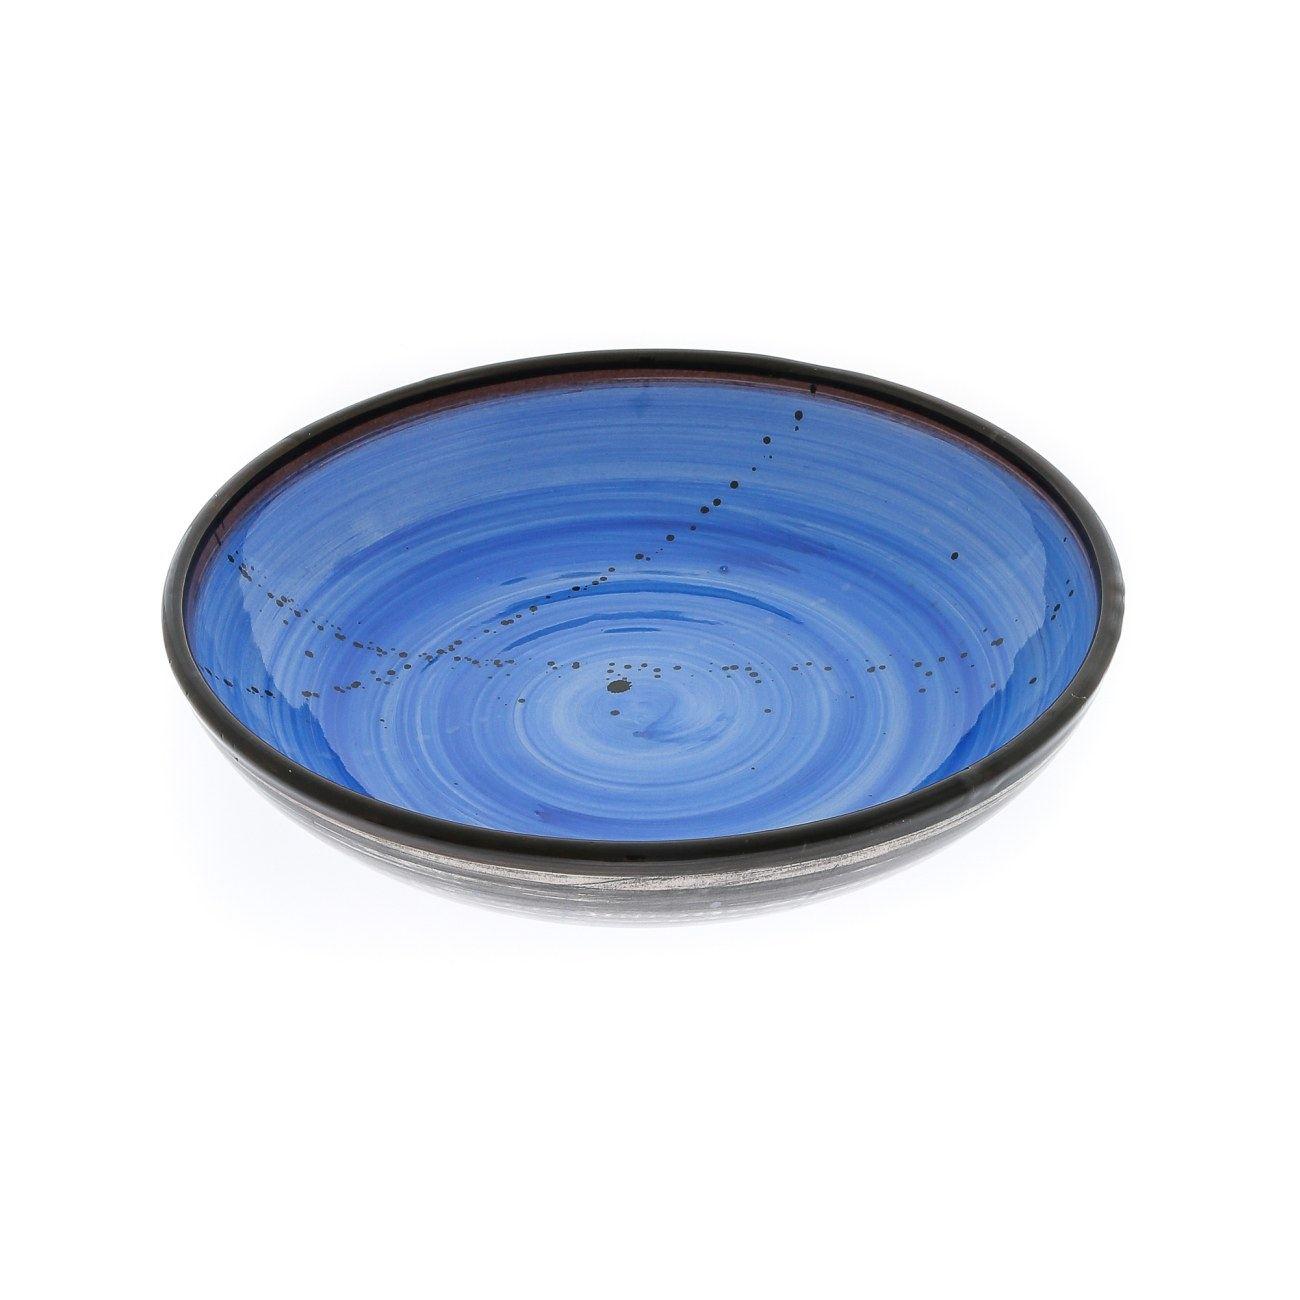 sc 1 st  Elite Crafters & Serving Bowl or Platter - Handmade Ceramic Centerpiece - Blue 13